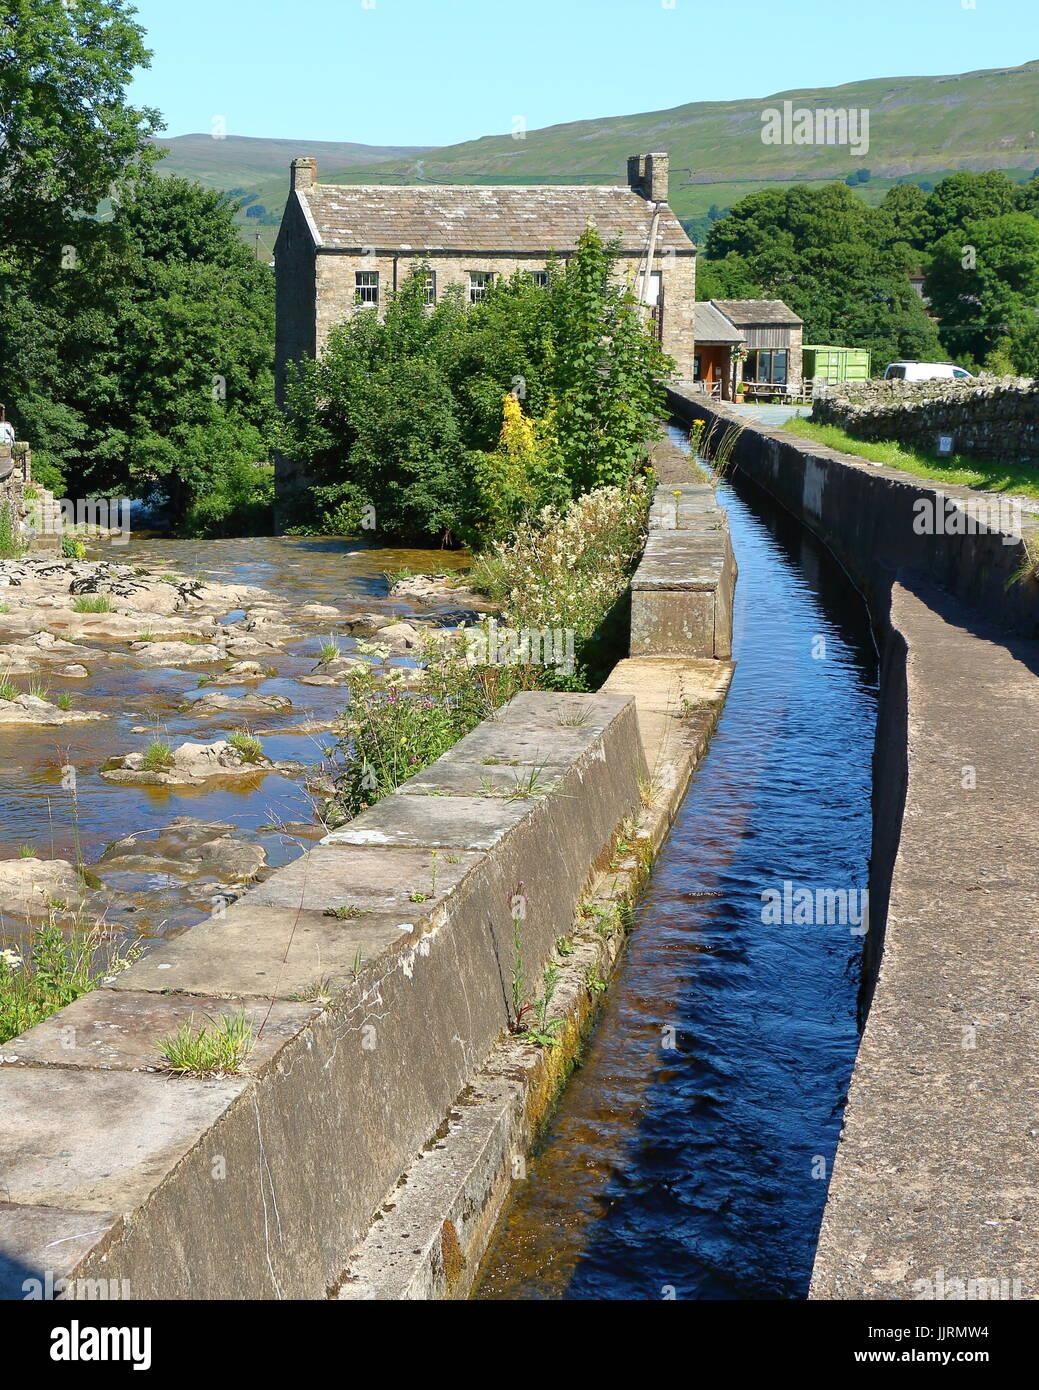 Gayle Mill, Wensleydale, Yorkshire Dales National Park, England, UK Stock Photo